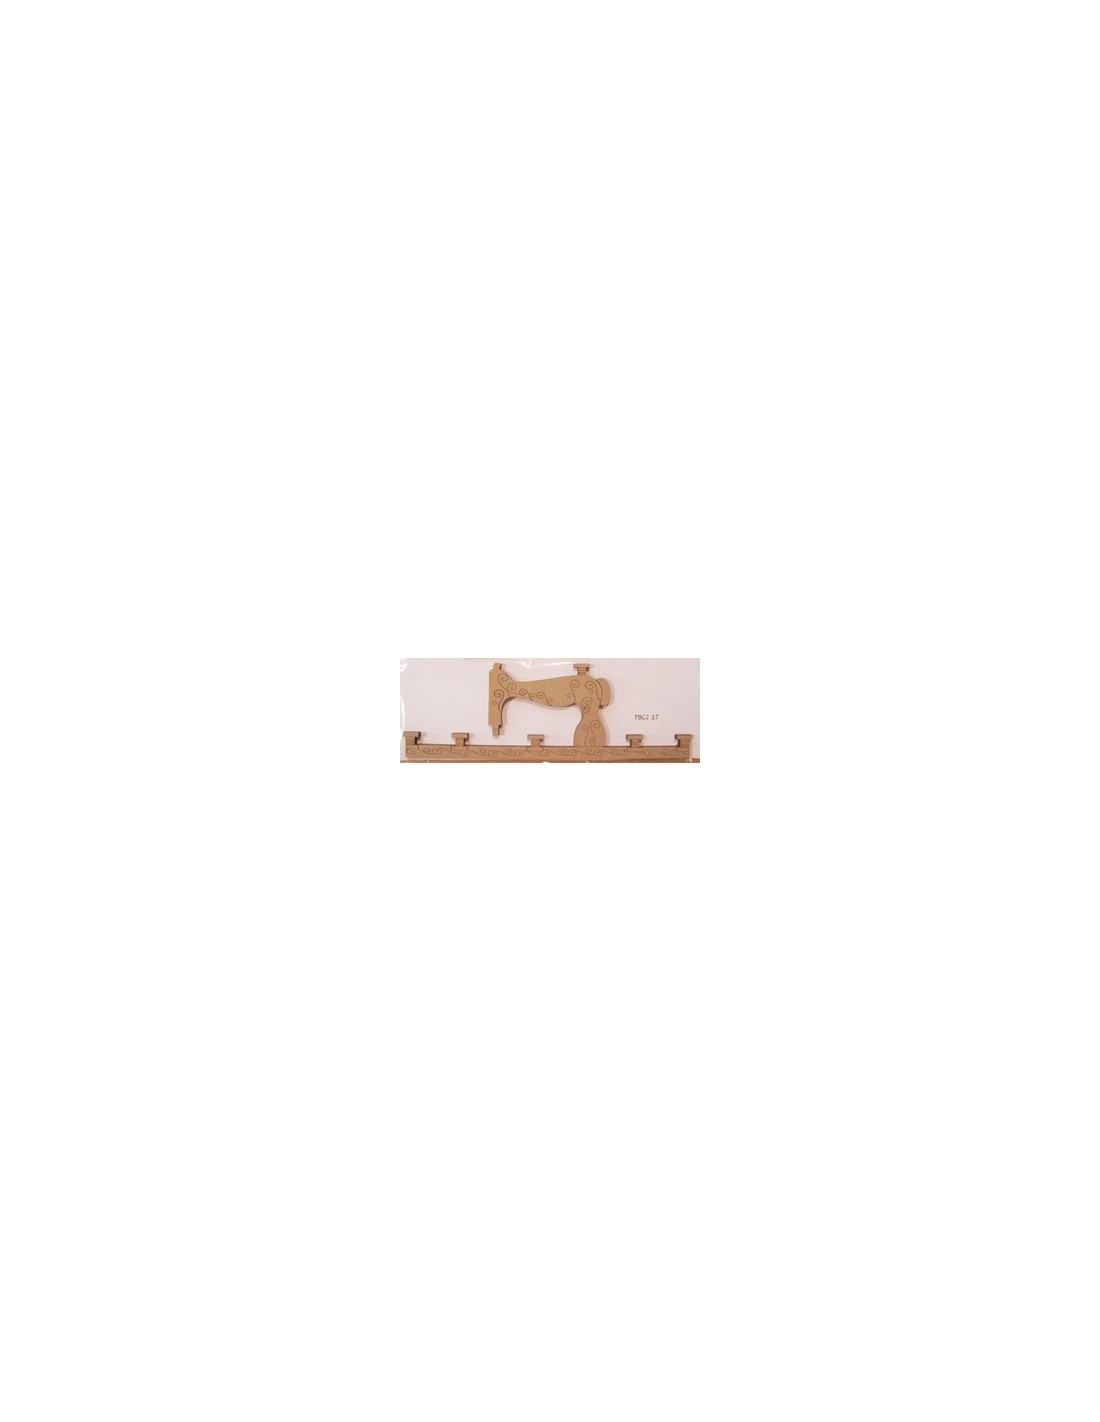 cintre en bois machine coudre 17 cm de large beige. Black Bedroom Furniture Sets. Home Design Ideas